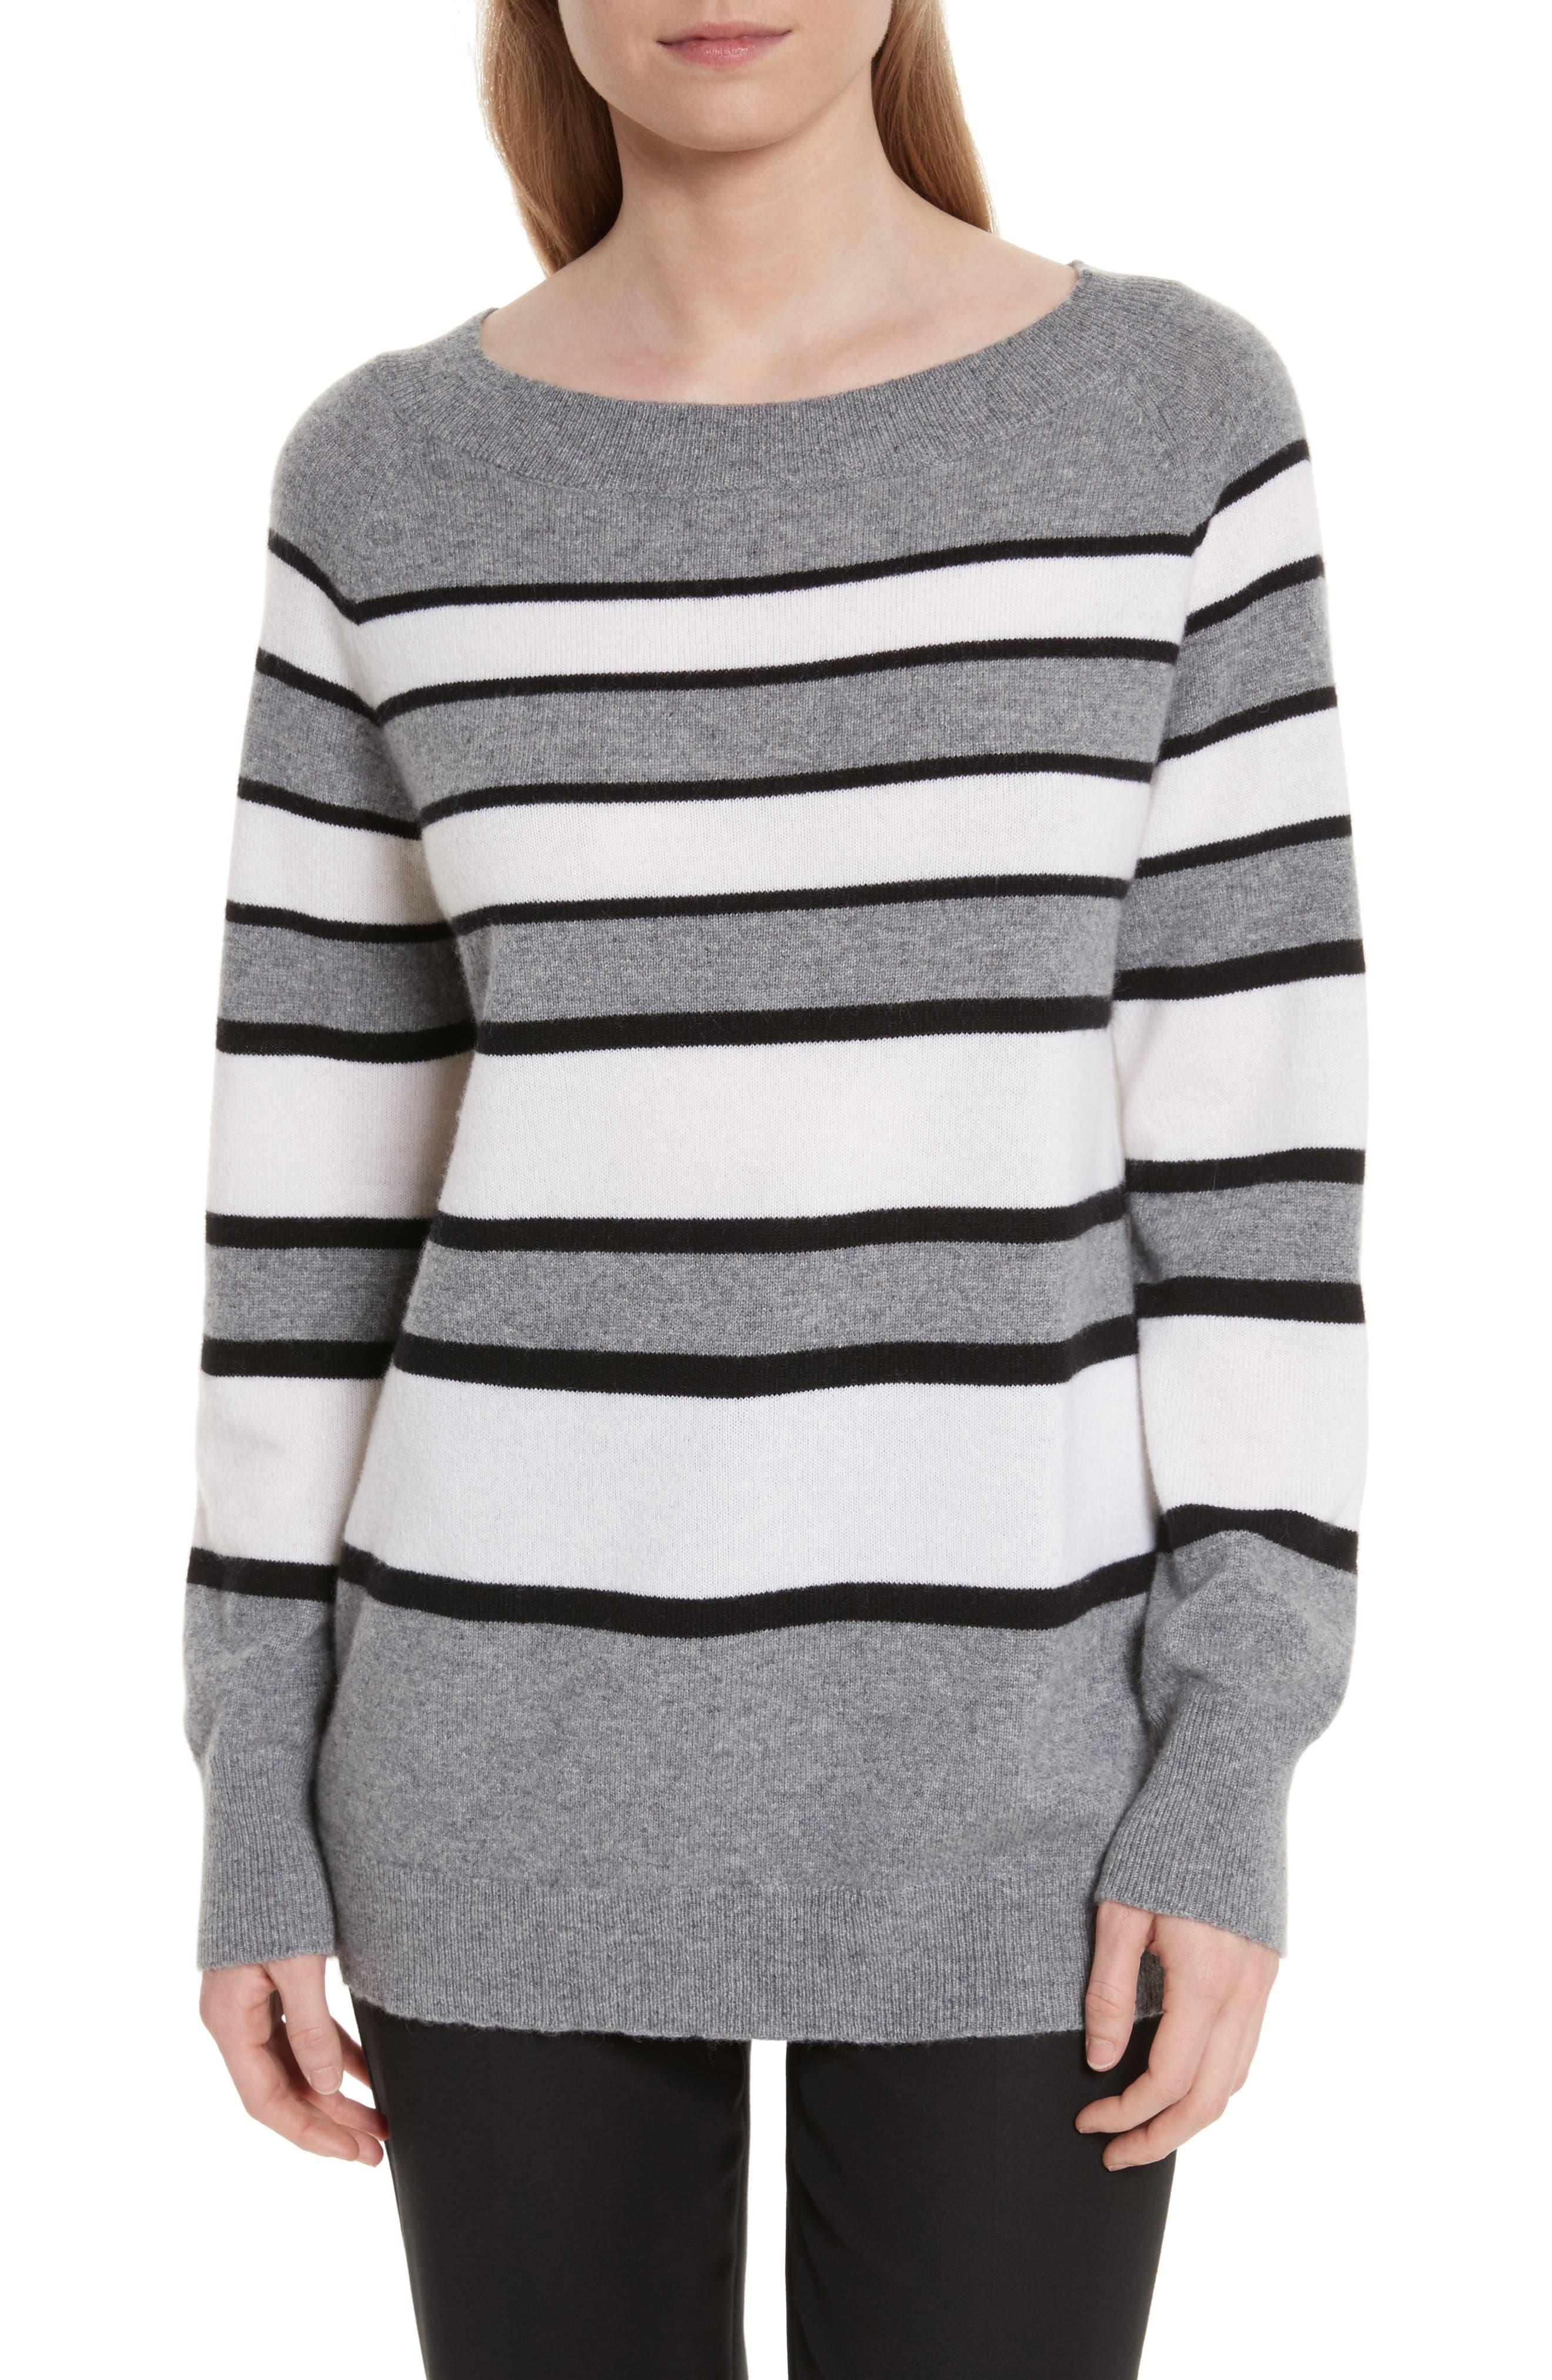 Main Image - Equipment Cody Stripe Cashmere Boat Neck Sweater